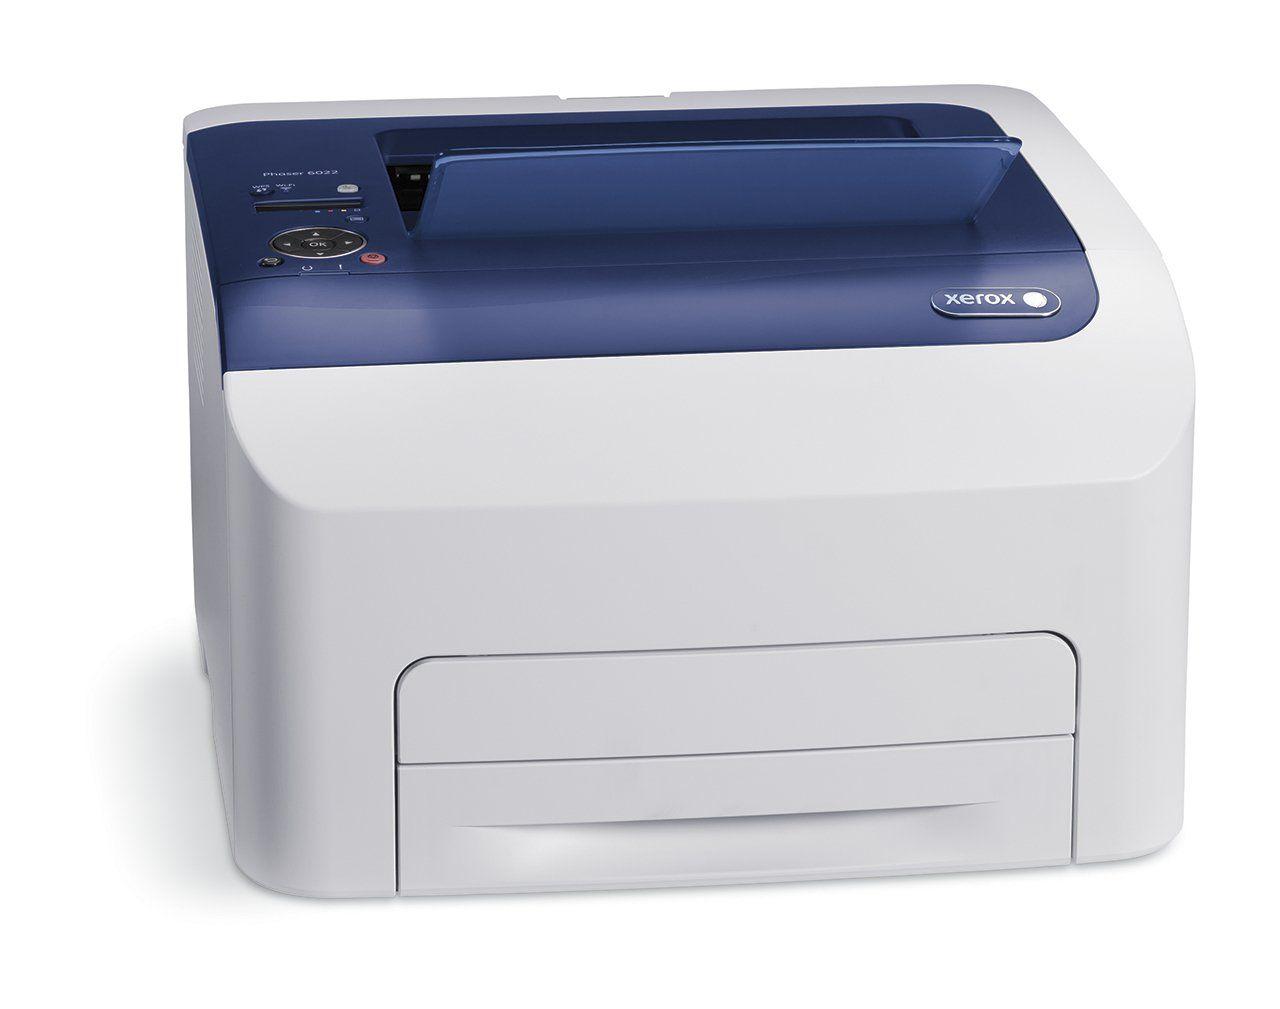 Xerox Phaser 6022 Ni Wireless Color Printer Click Image For